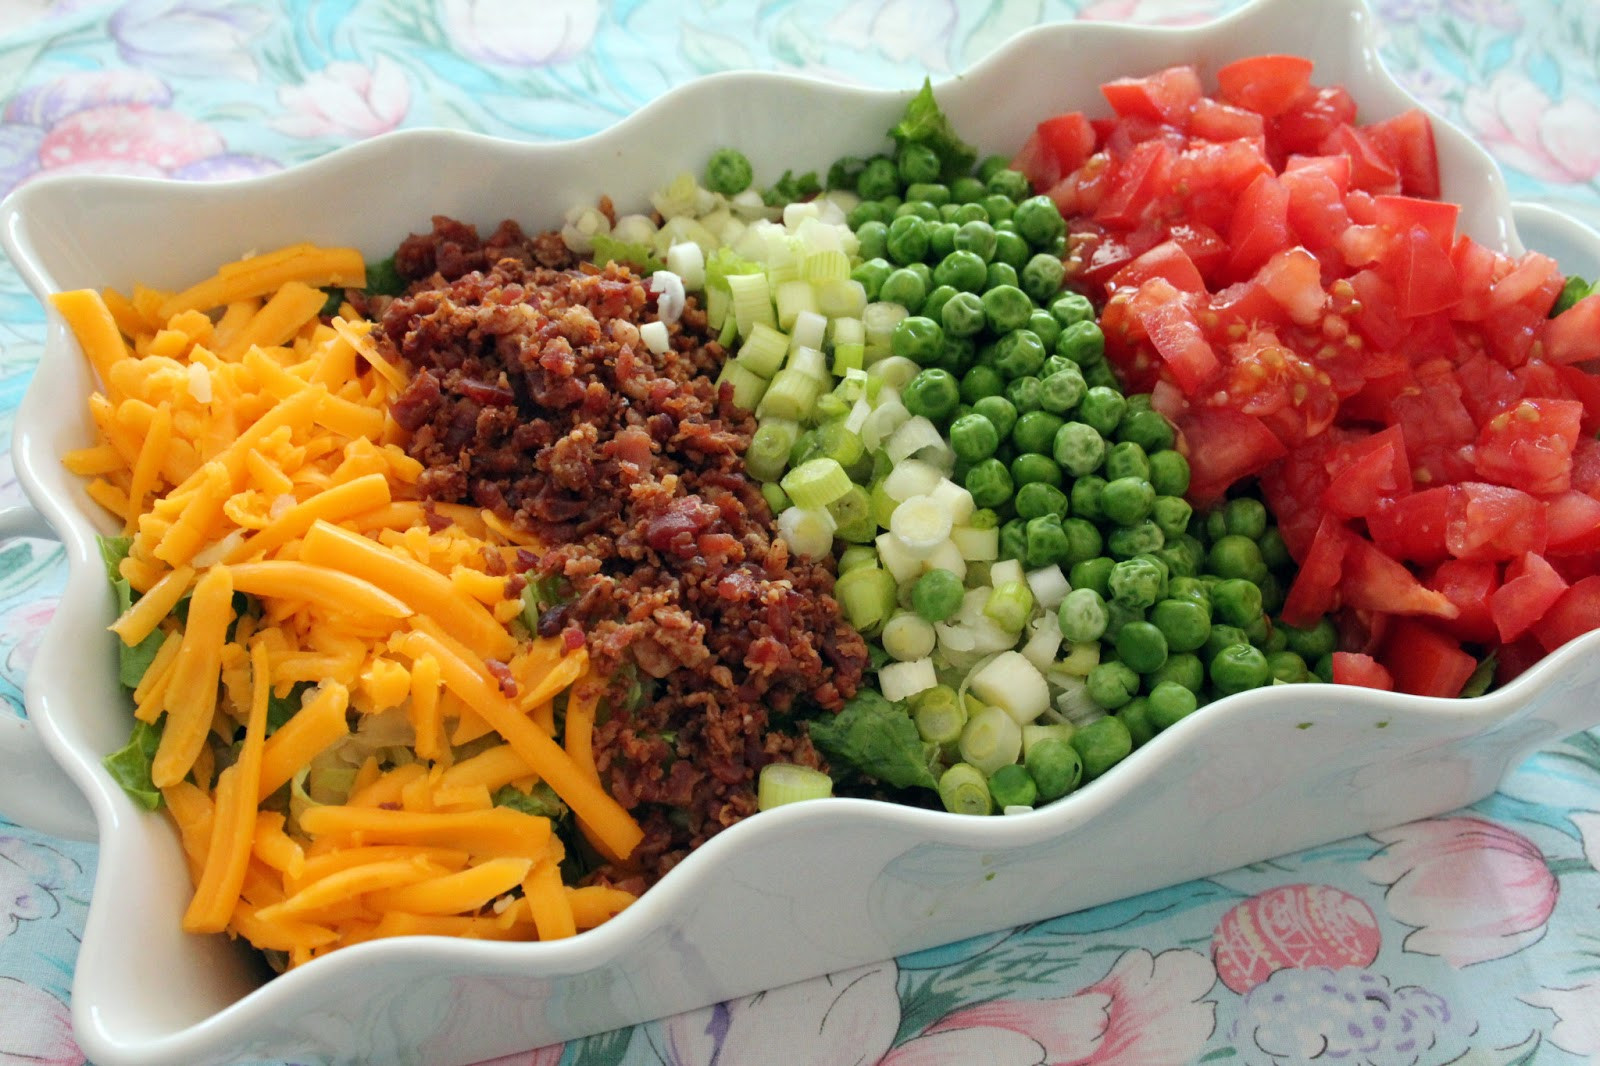 Salad For Easter Dinner  Grain Crazy Cobb Salad Easter Dinner or anytime